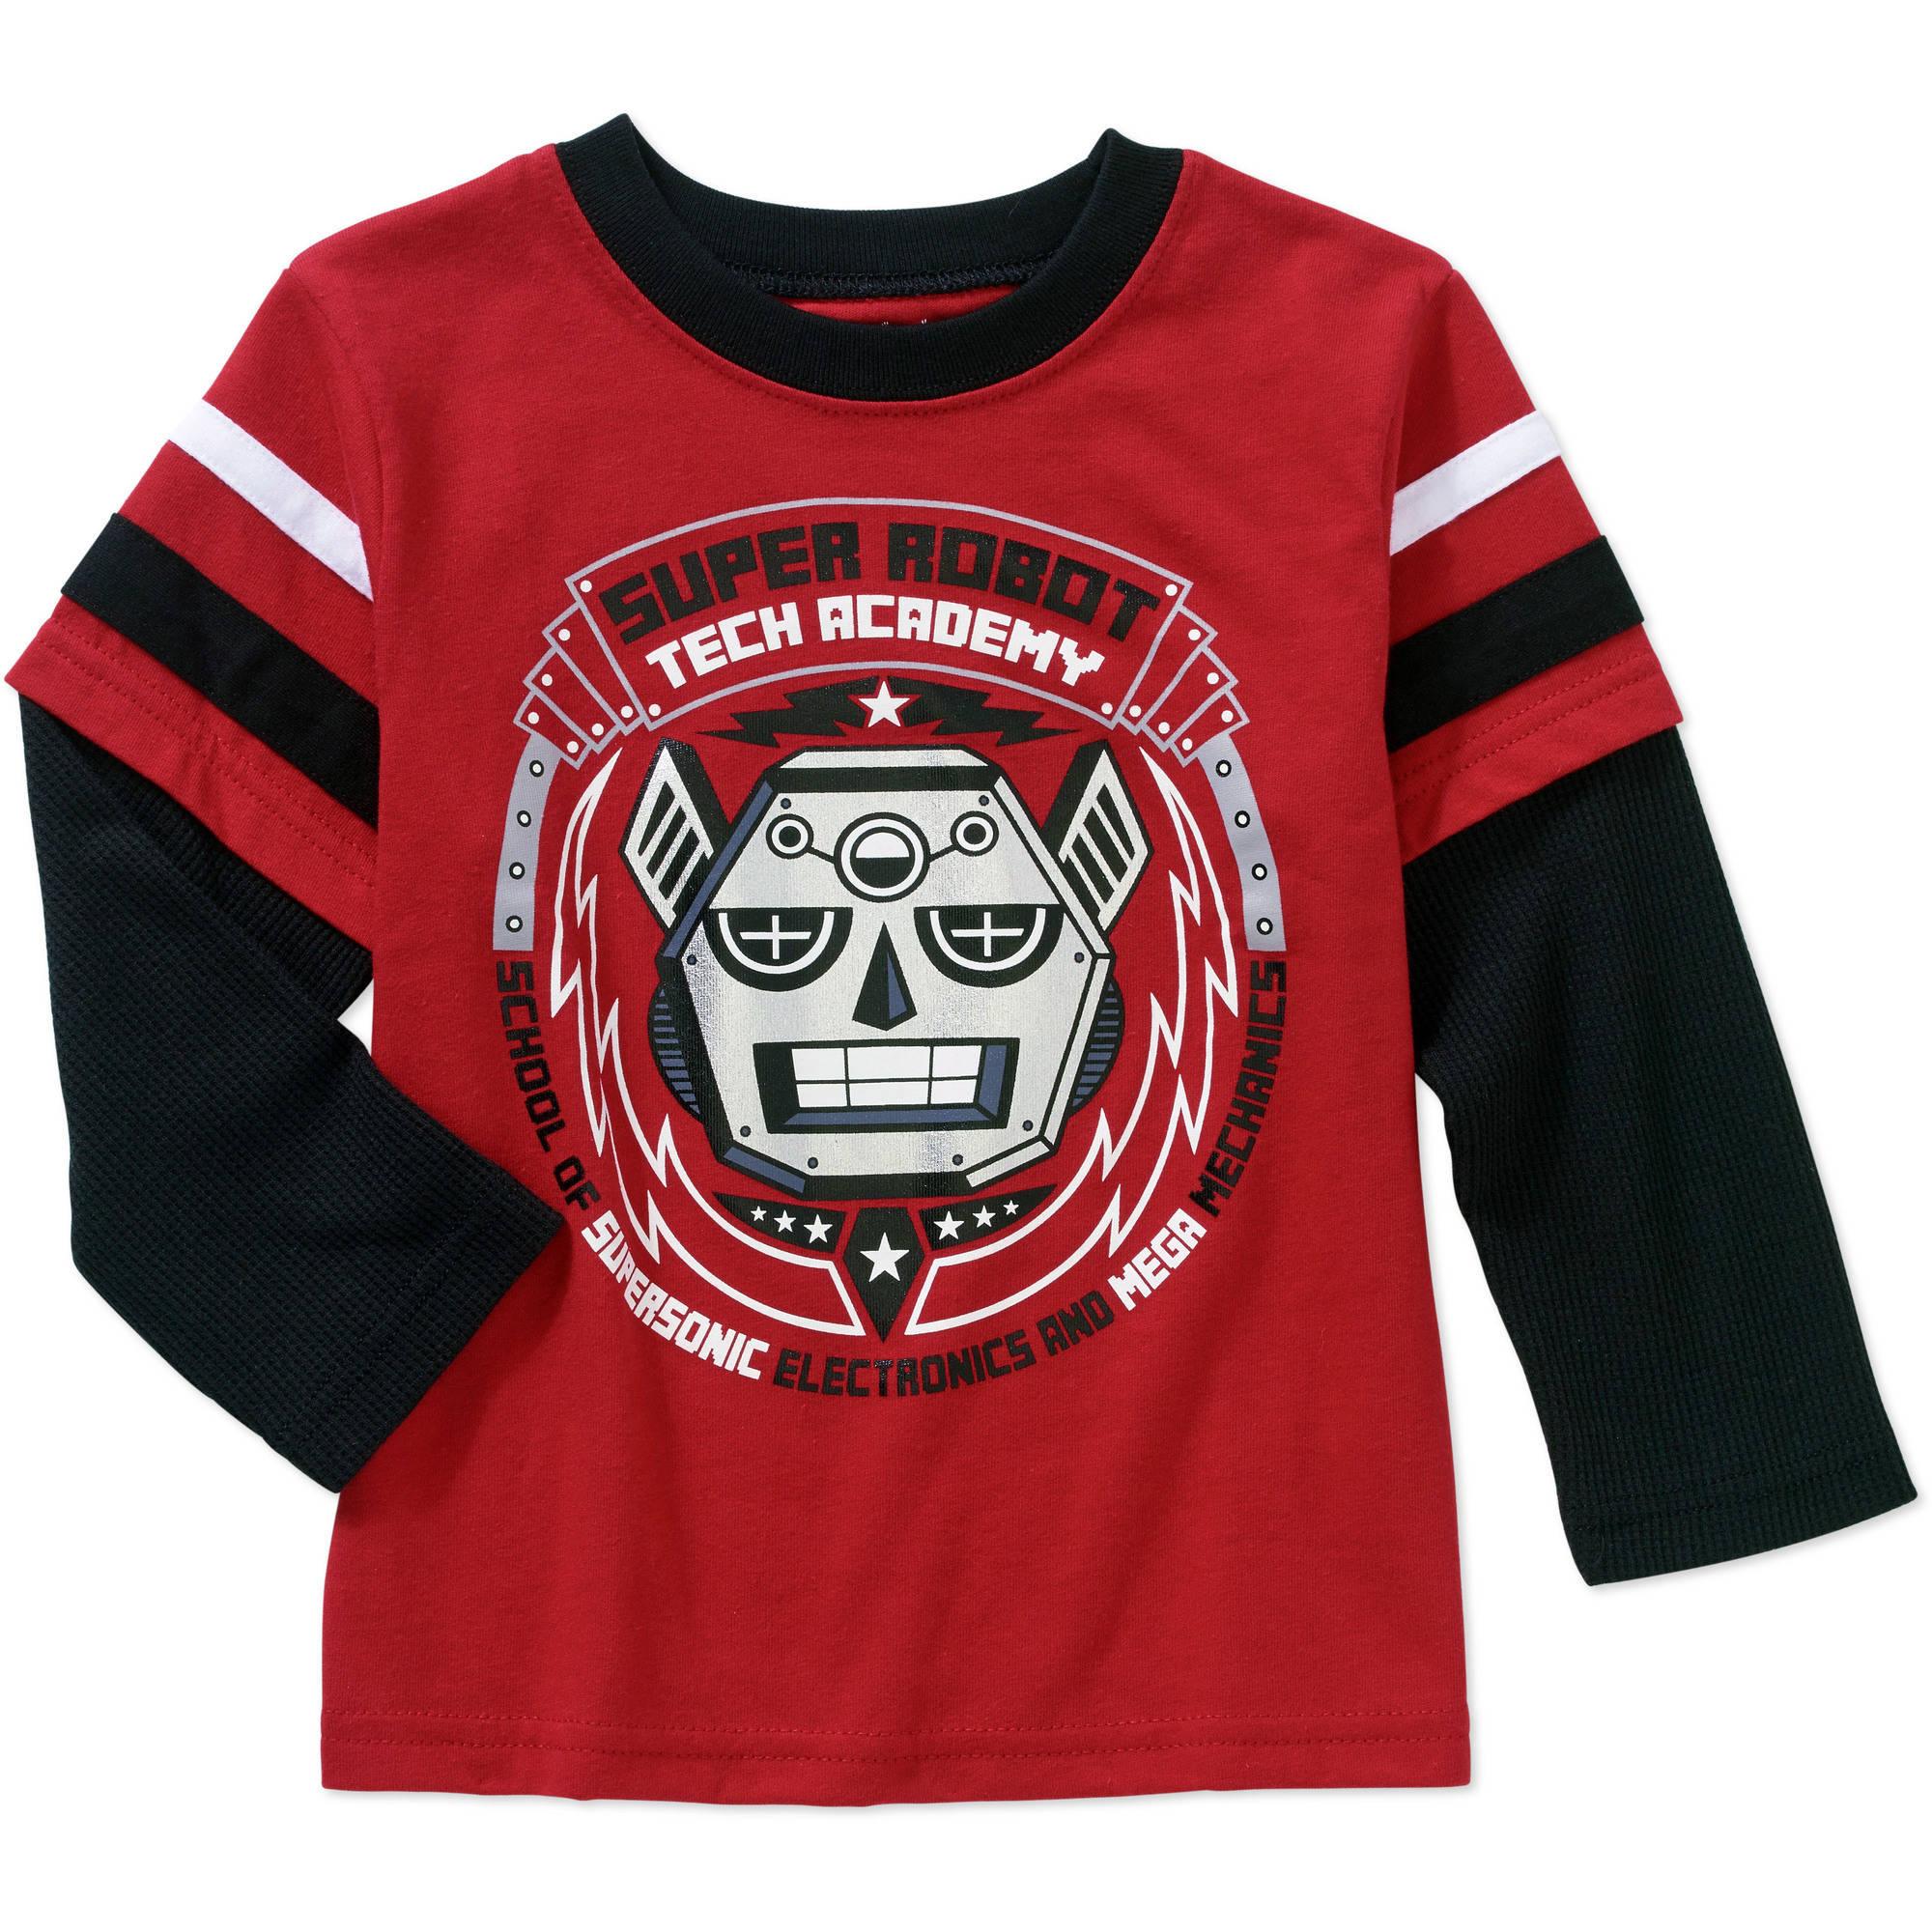 Garanimals Baby Toddler Boys' Long Sleeve Graphic Hangdown Tee Shirt